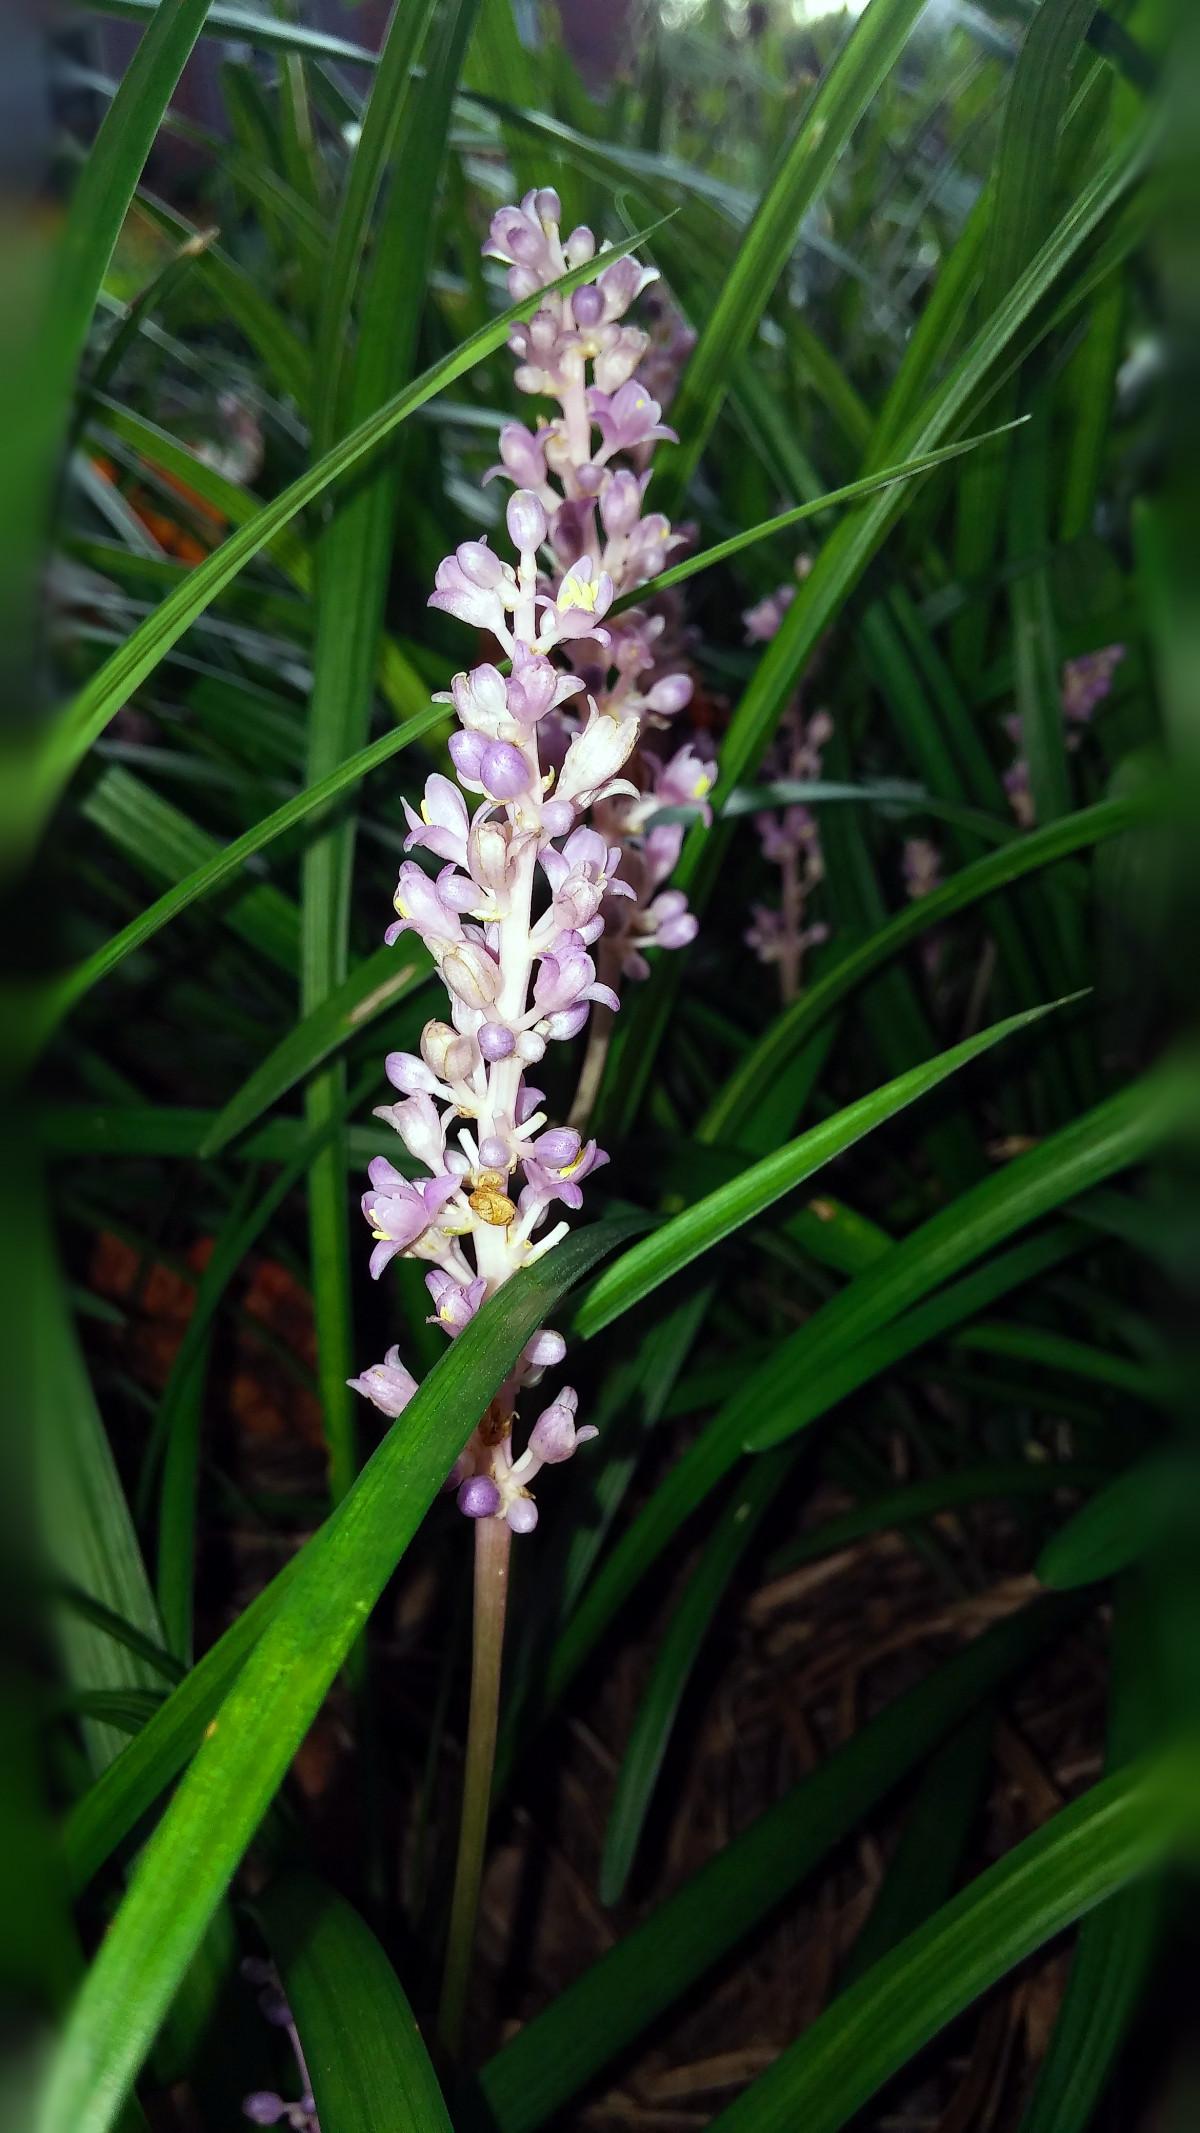 Free images rain wet foliage botany garden flora for Grass like flowering plants